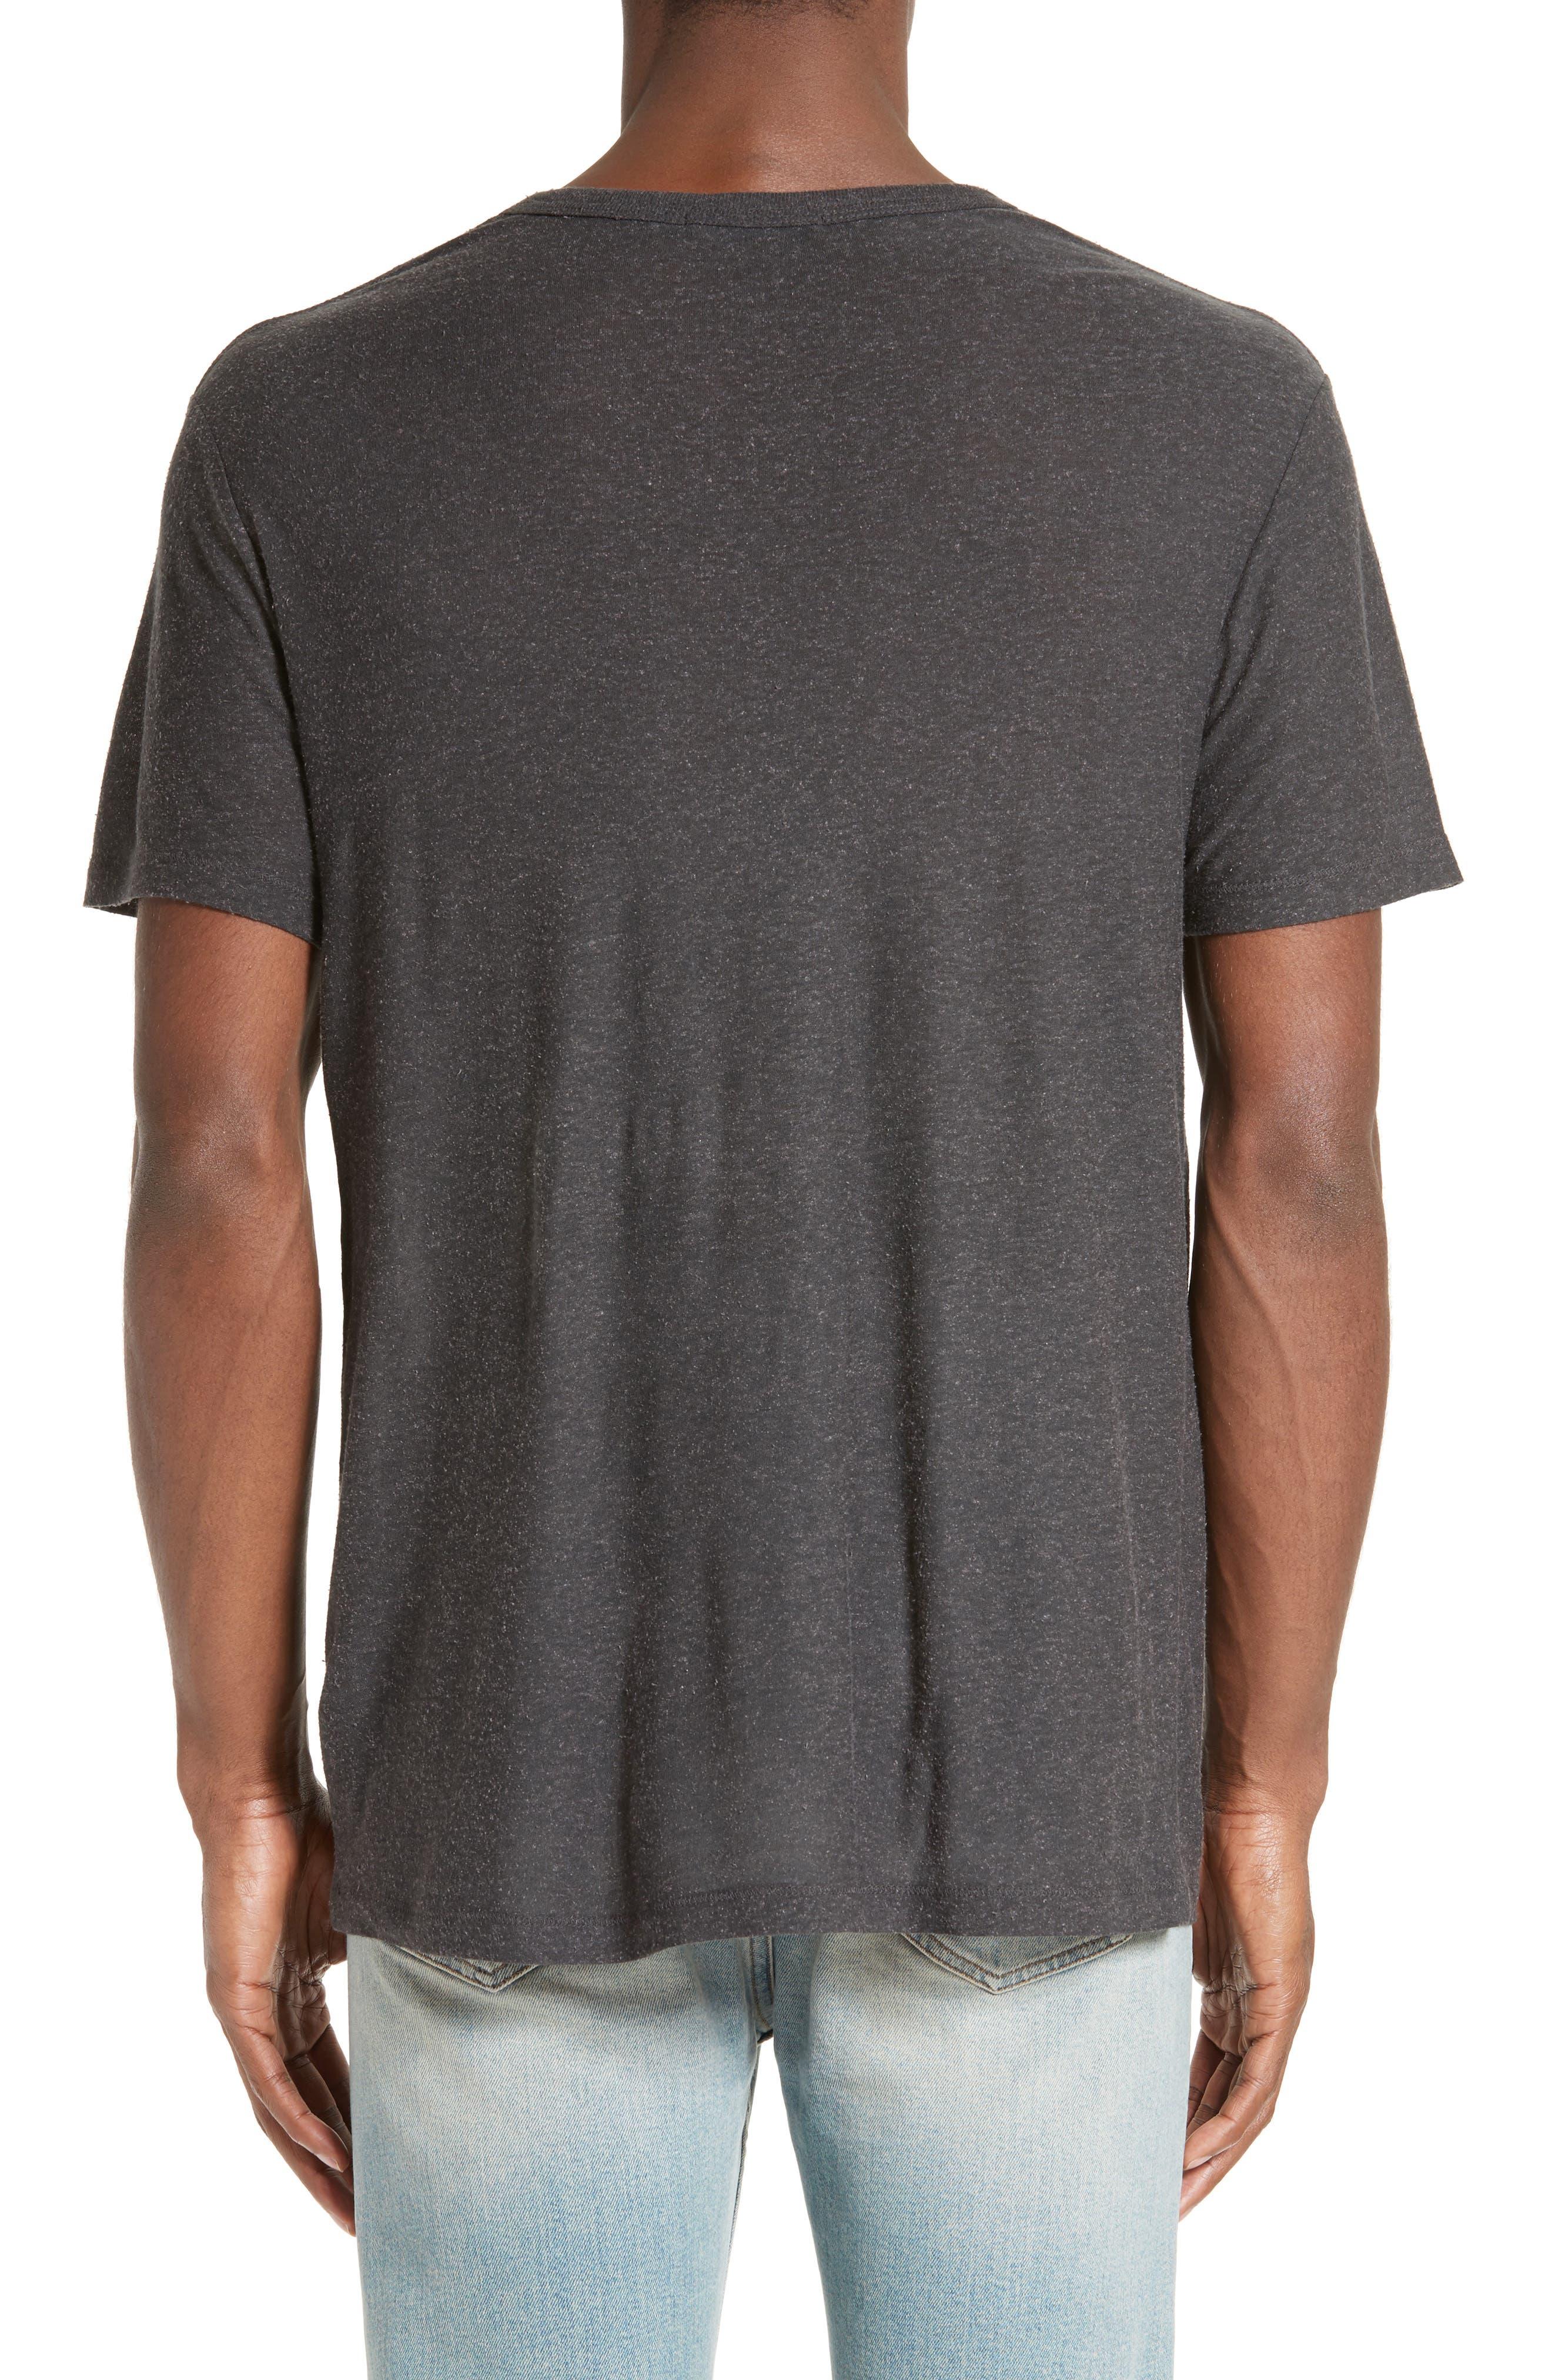 Alternate Image 2  - T by Alexander Wang 'Pilly' Crewneck T-Shirt